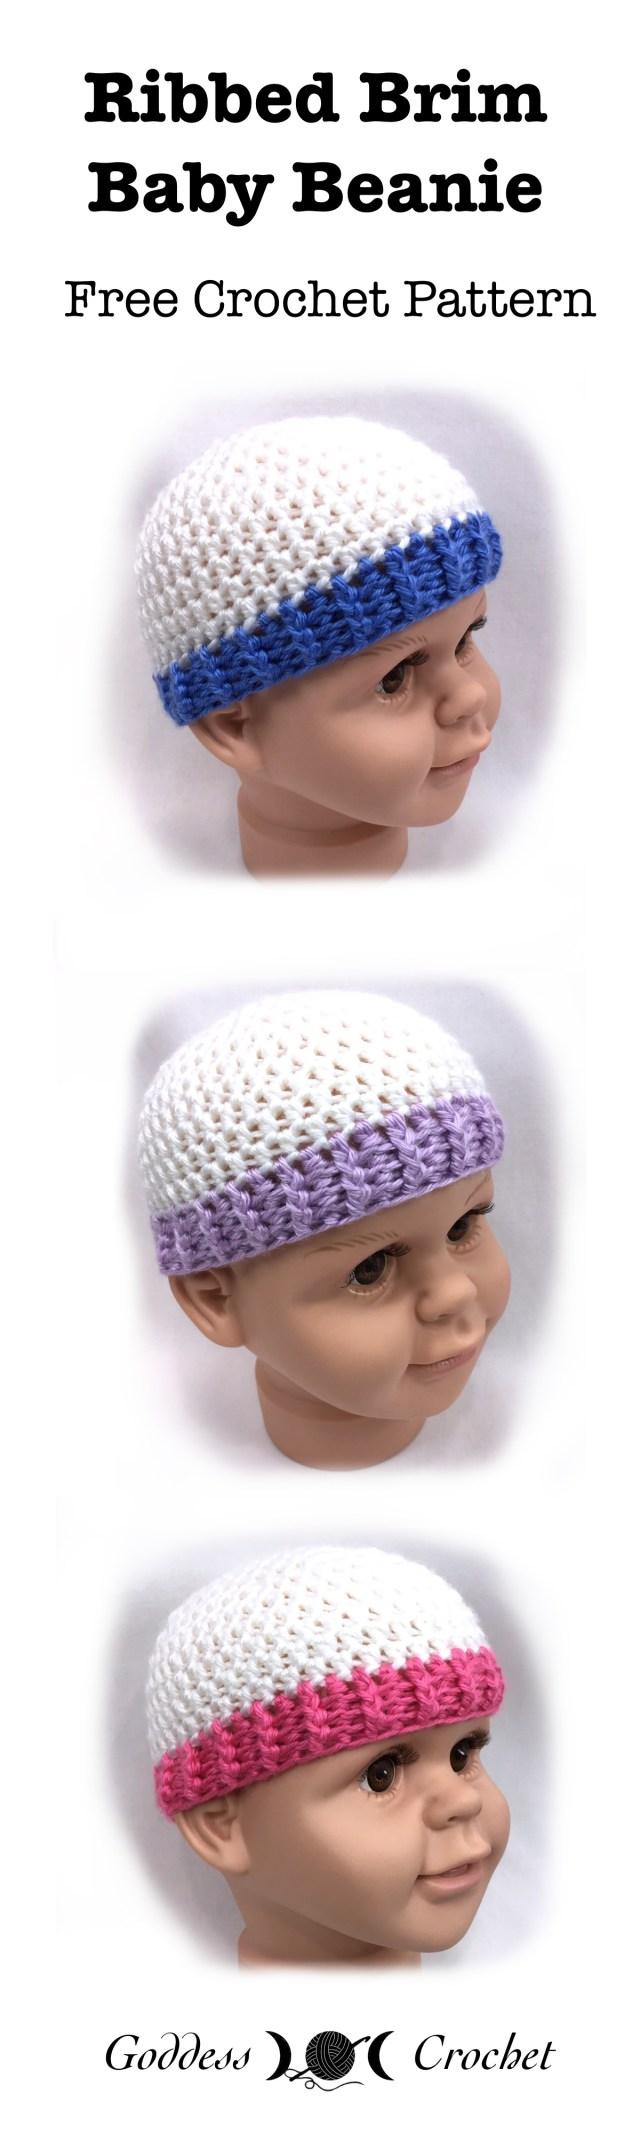 Ribbed Brim Baby Beanie Free Crochet Pattern Goddess Crochet